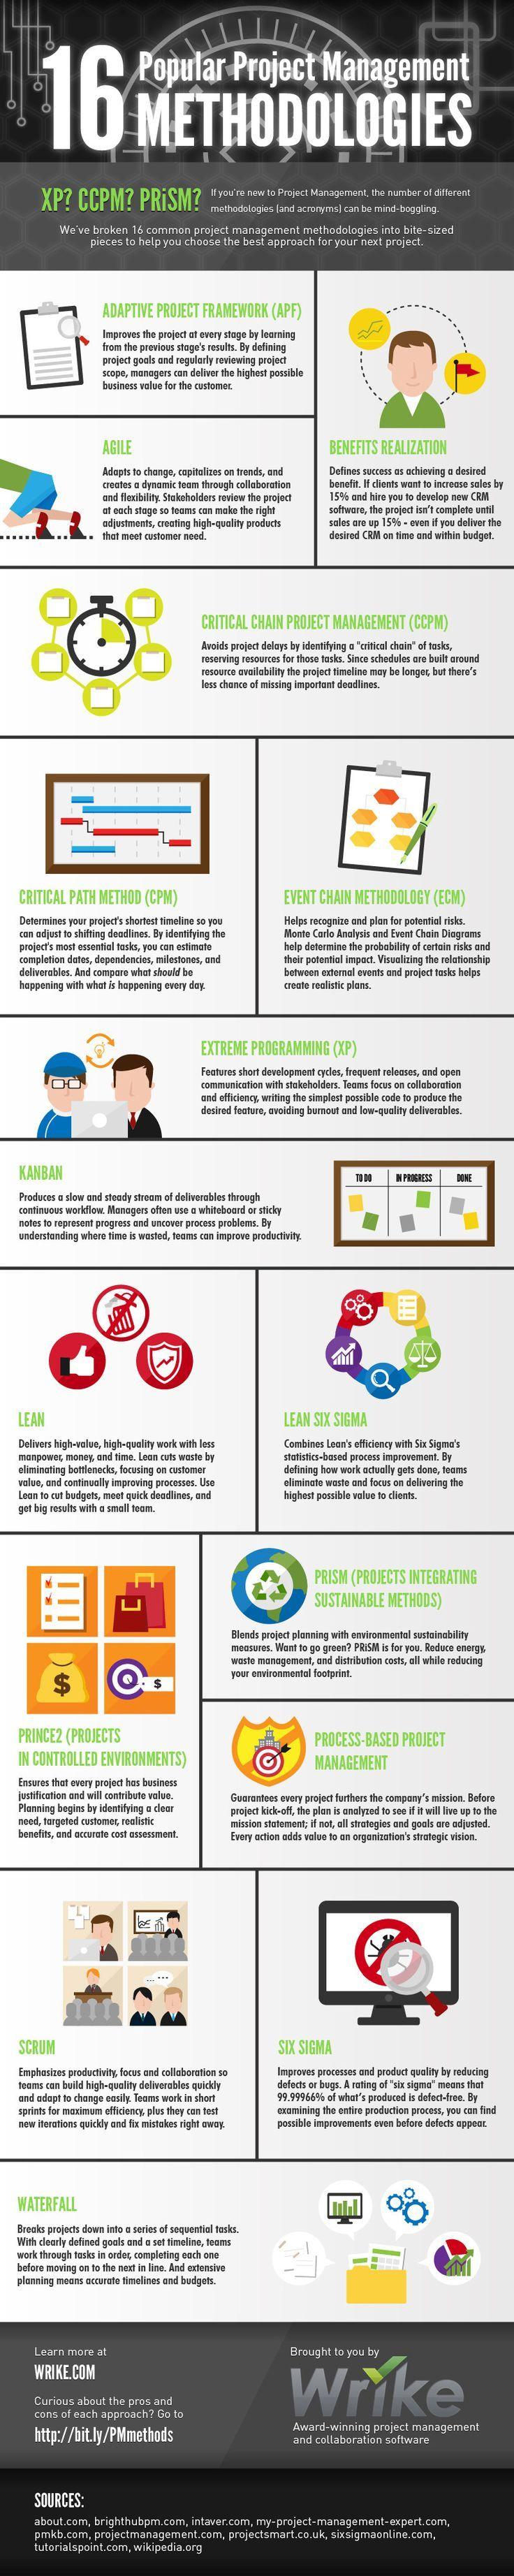 16 Popular Project Management Methodologies infographic ProjectMenagement